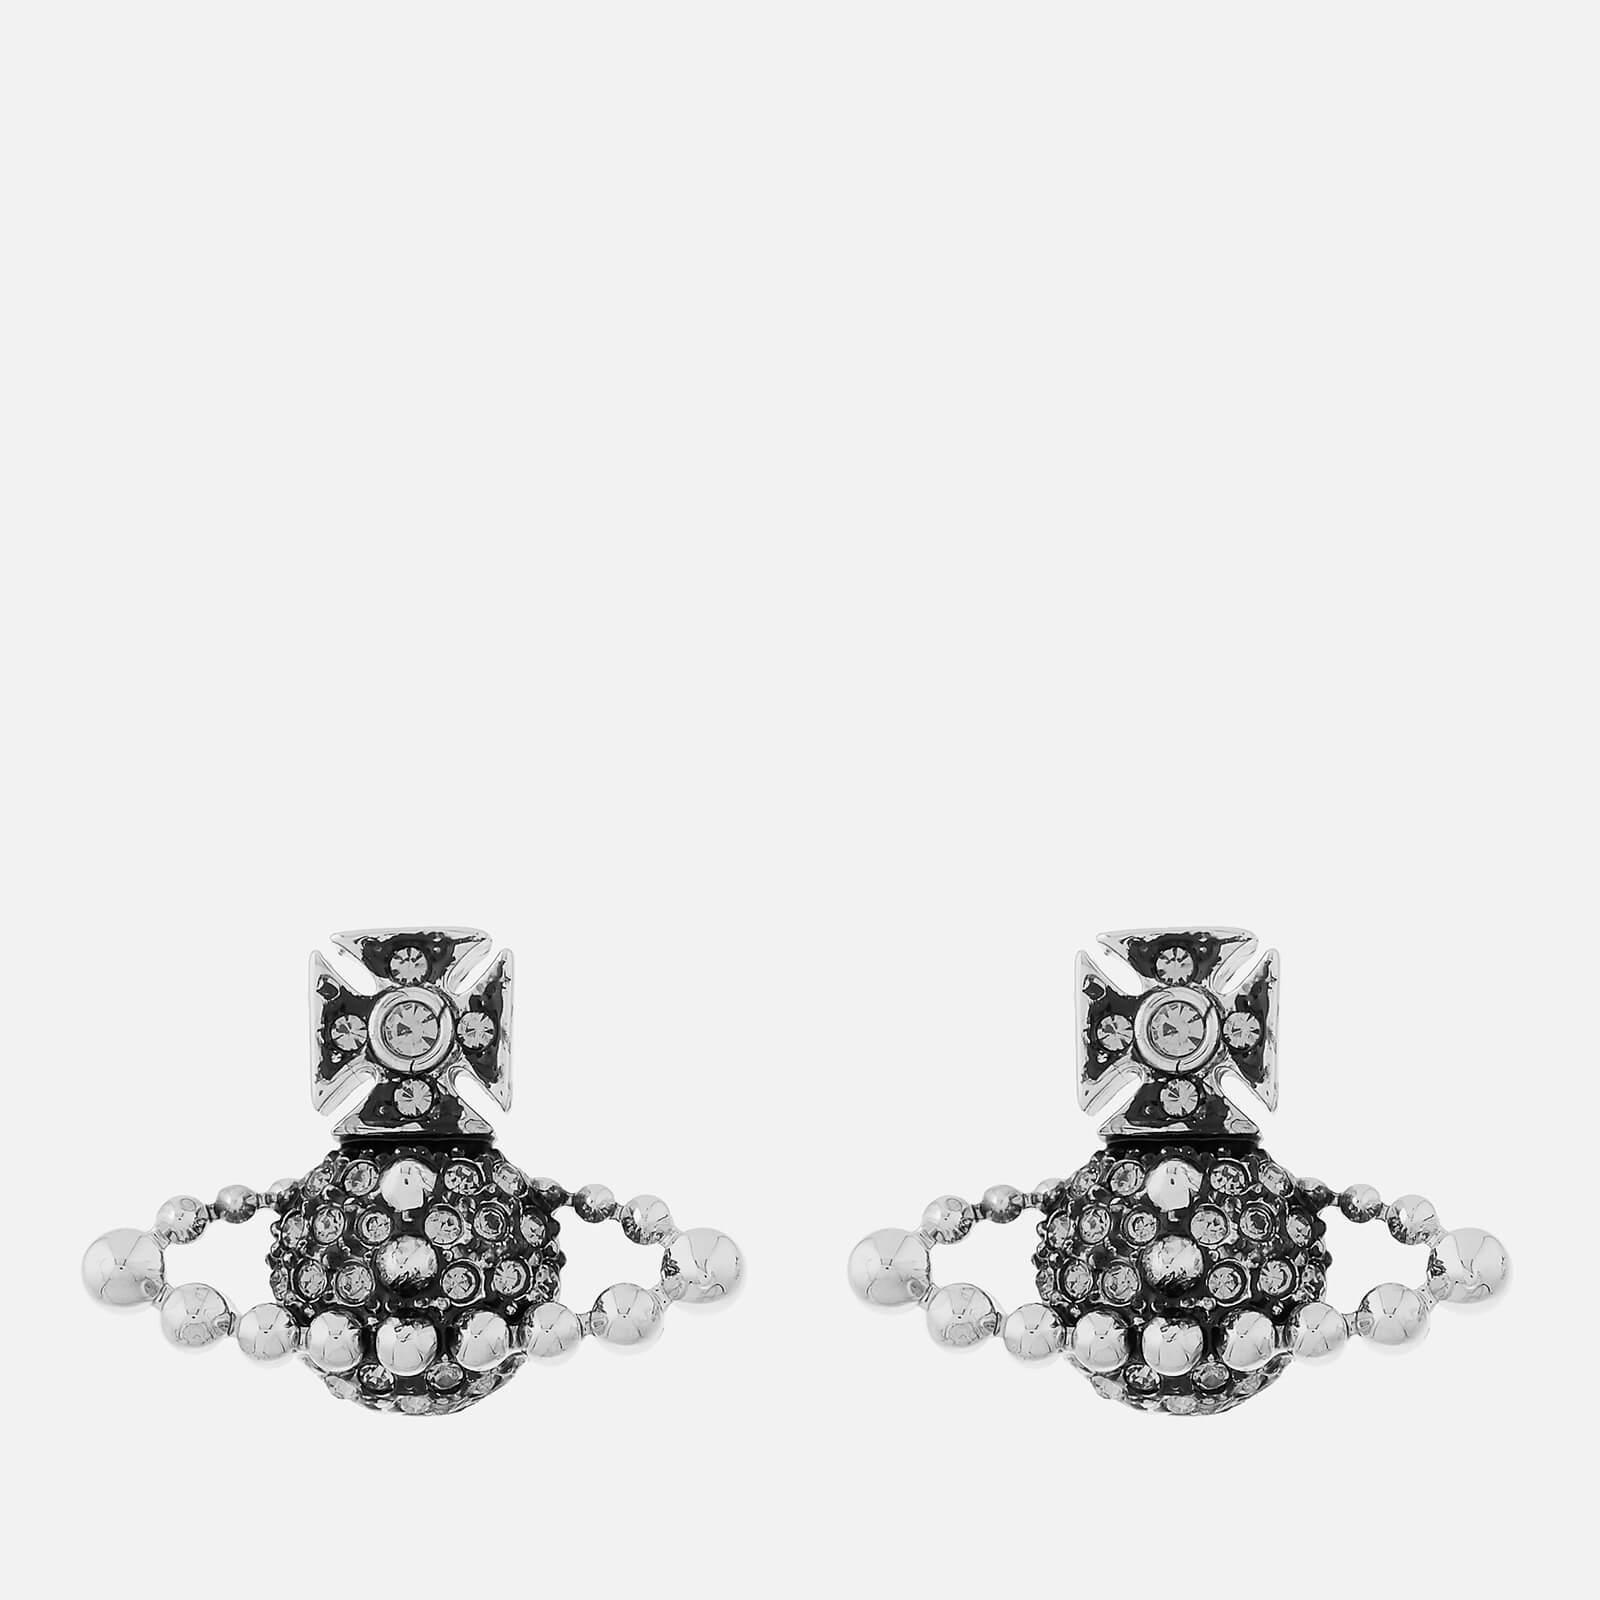 e7ec2354e Lyst - Vivienne Westwood Lena Bas Relief Earrings